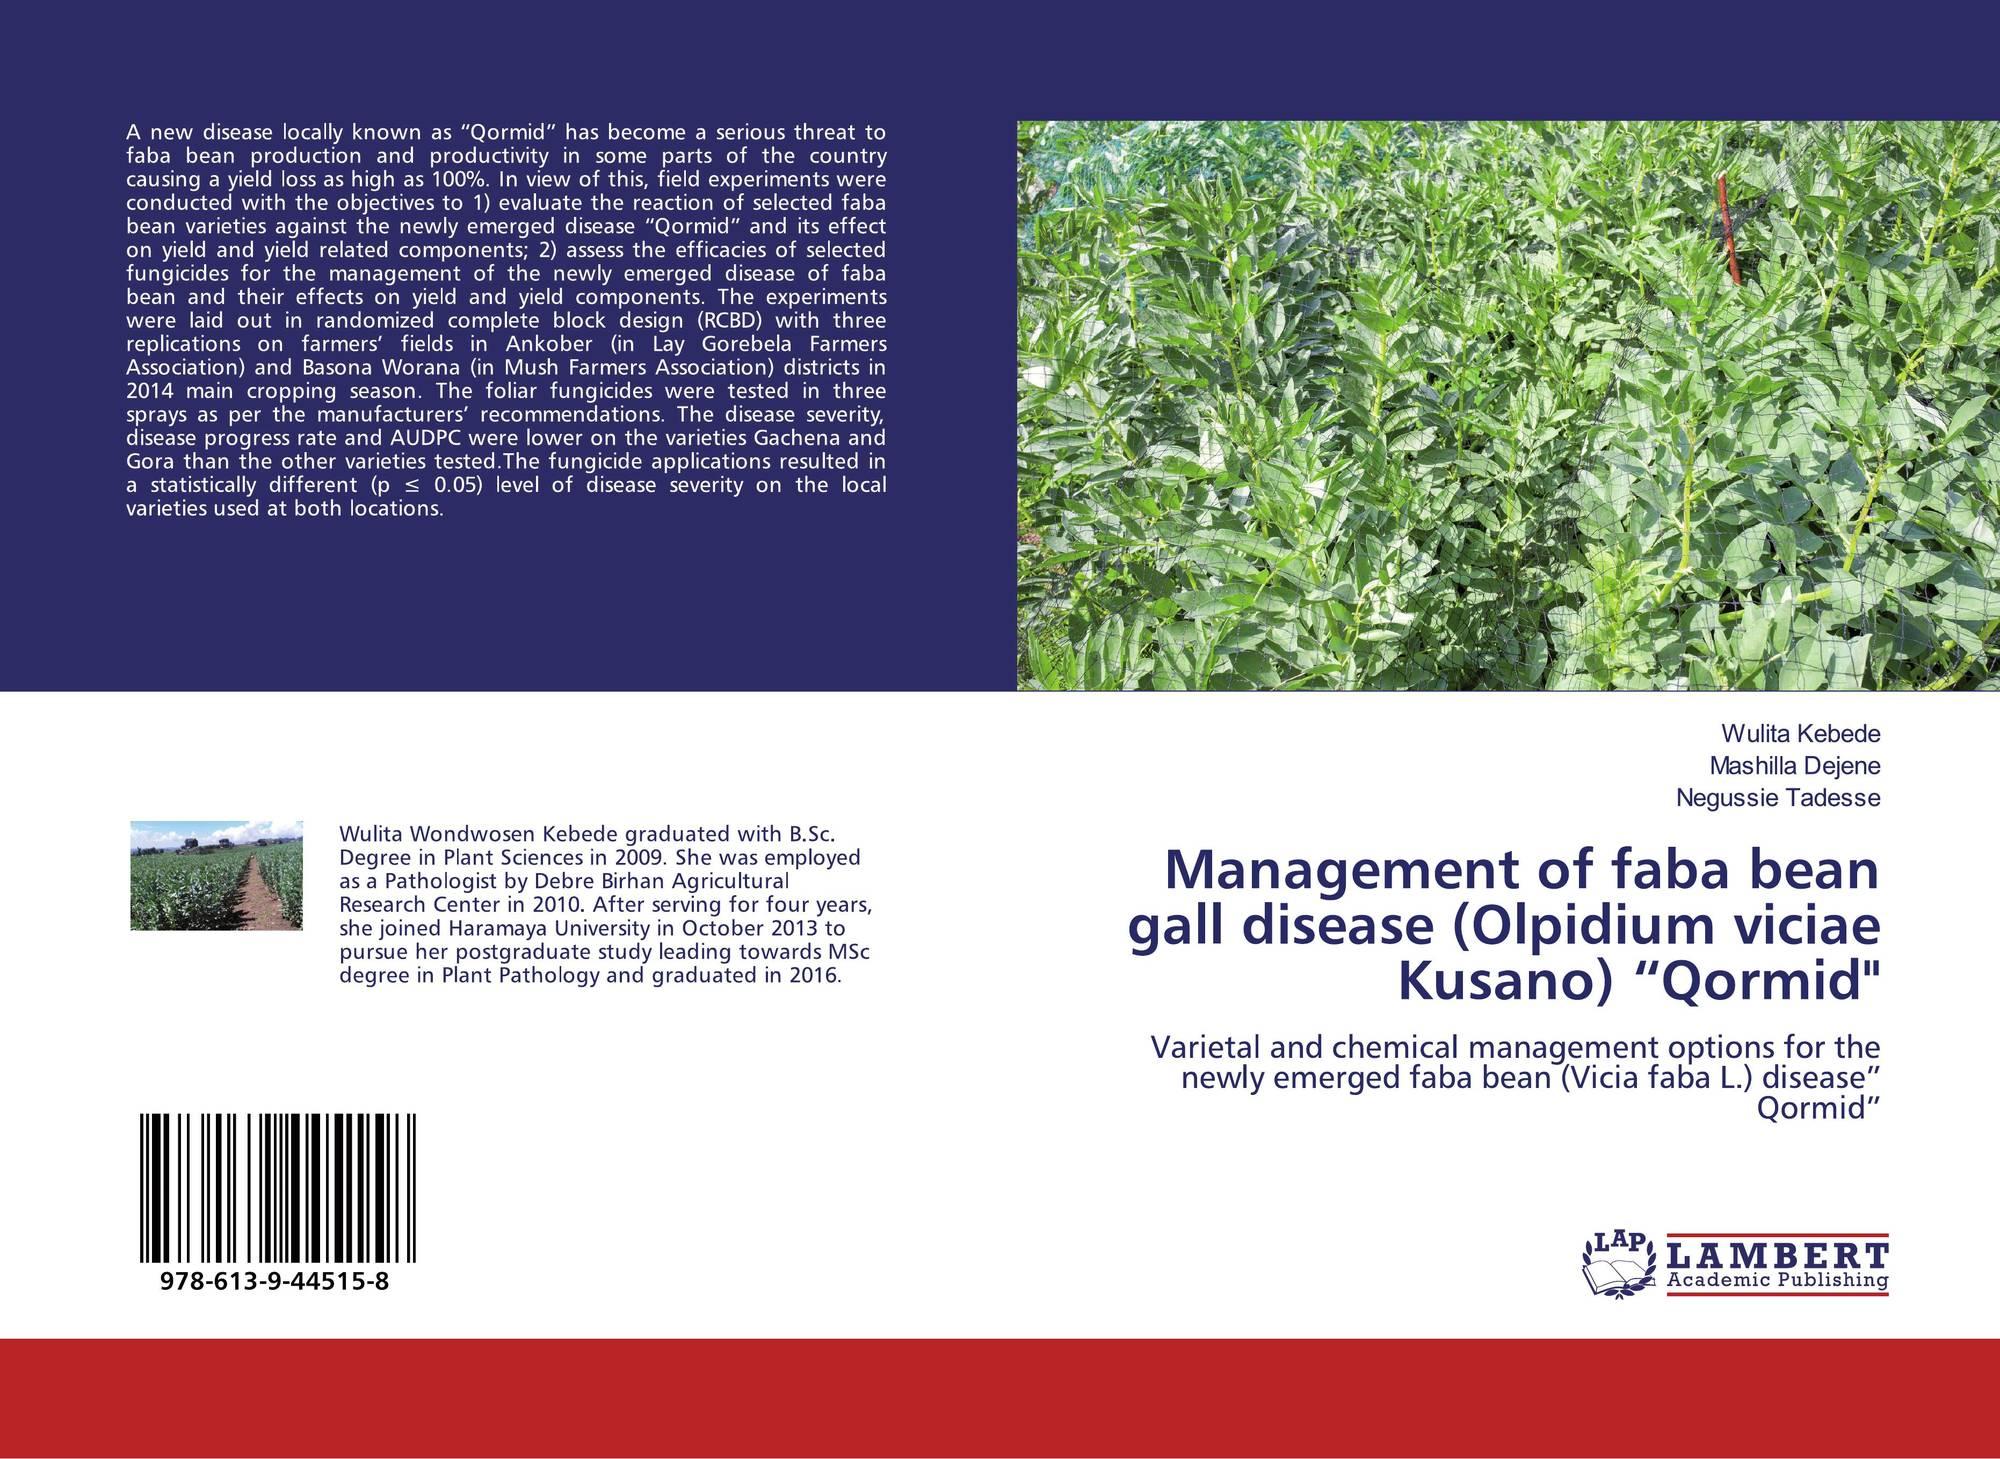 Management Of Faba Bean Gall Disease Olpidium Viciae Kusano